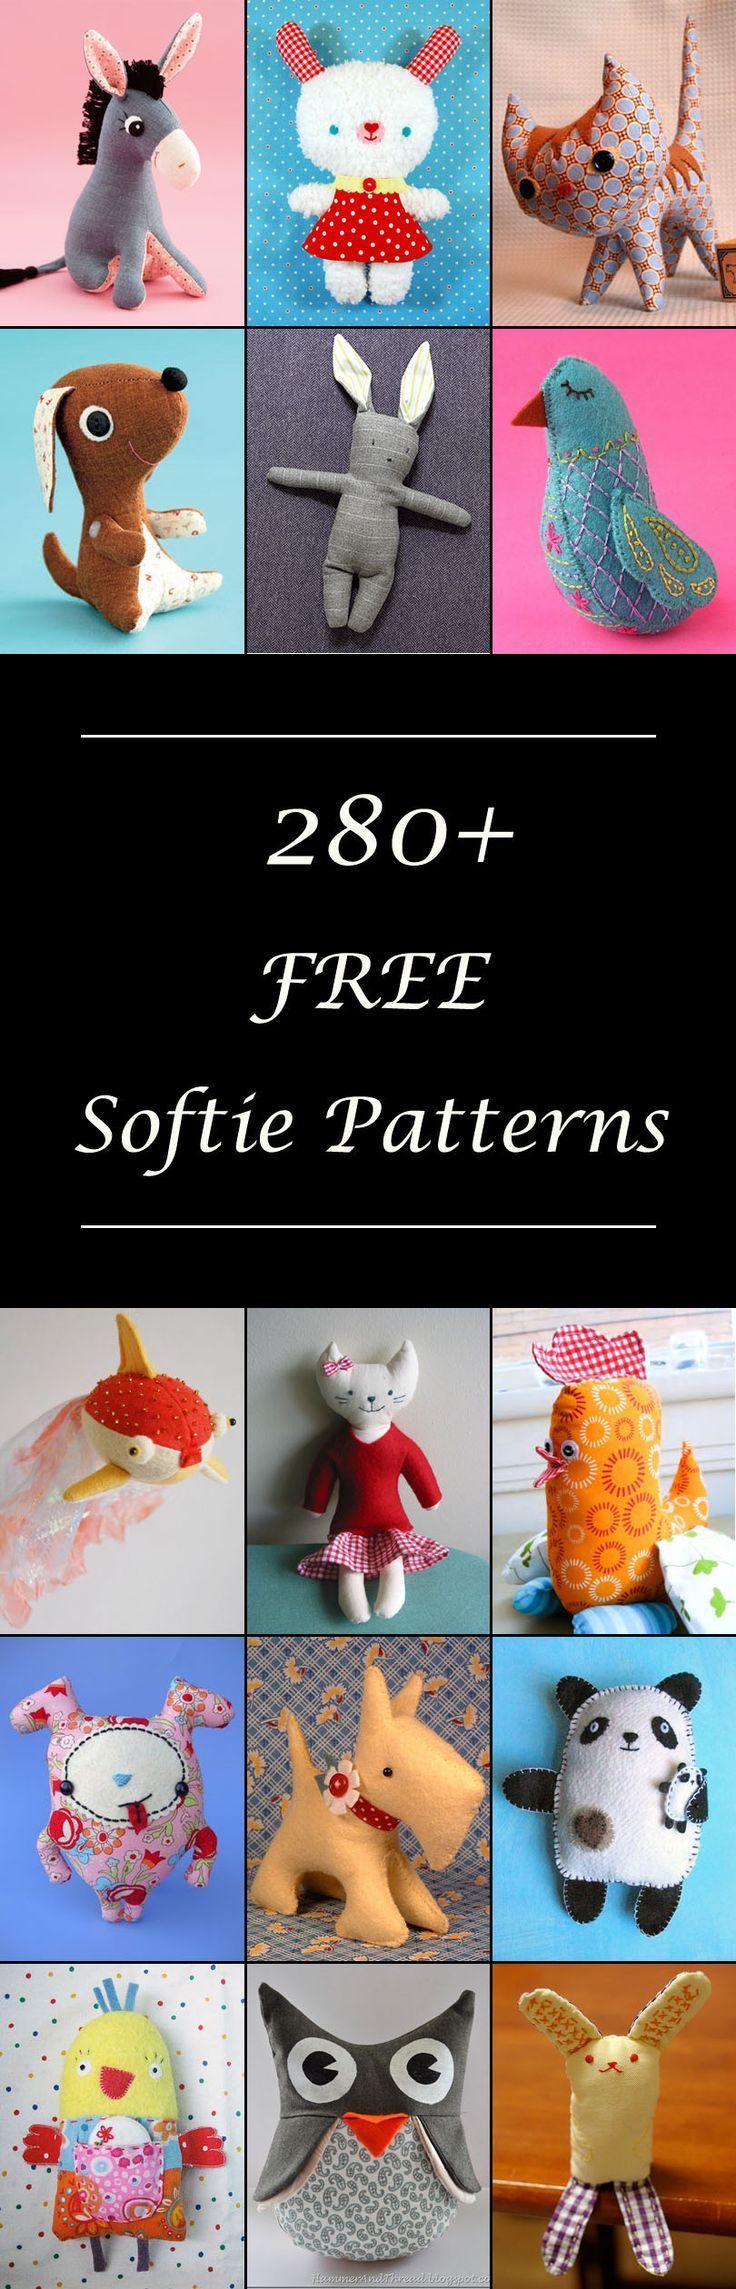 280+ kostenlose Kuscheltiermuster   – Plushies, Pillows, Doorstops, Pincusions